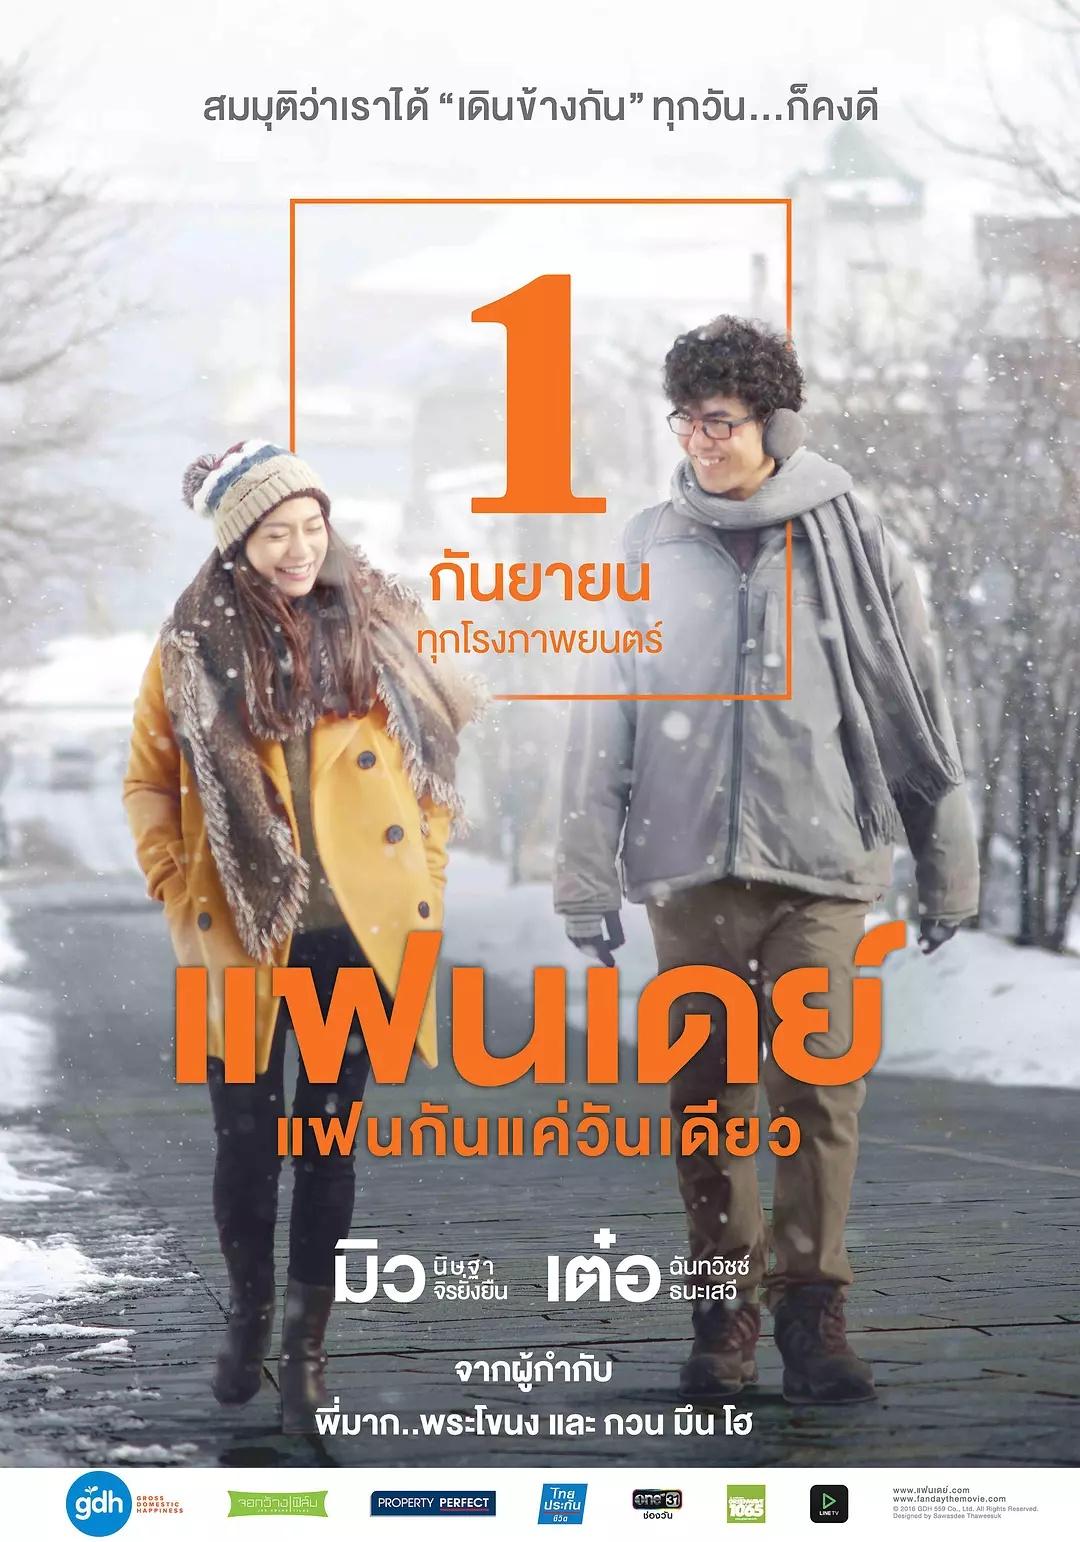 One Day drama thailand romantis bagus